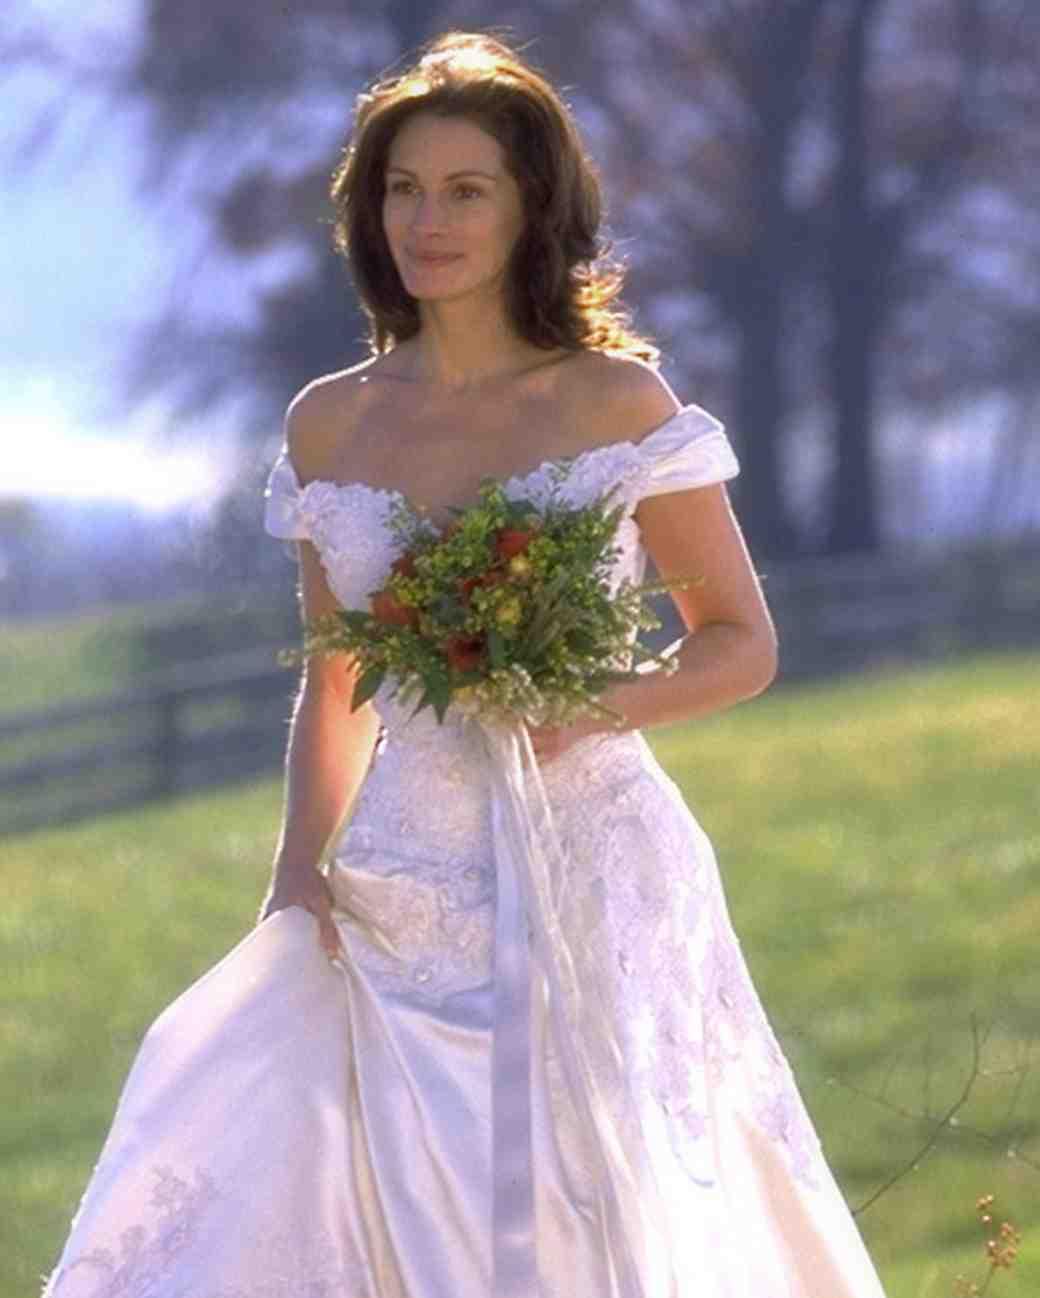 runaway-bride-wedding-dress-0515